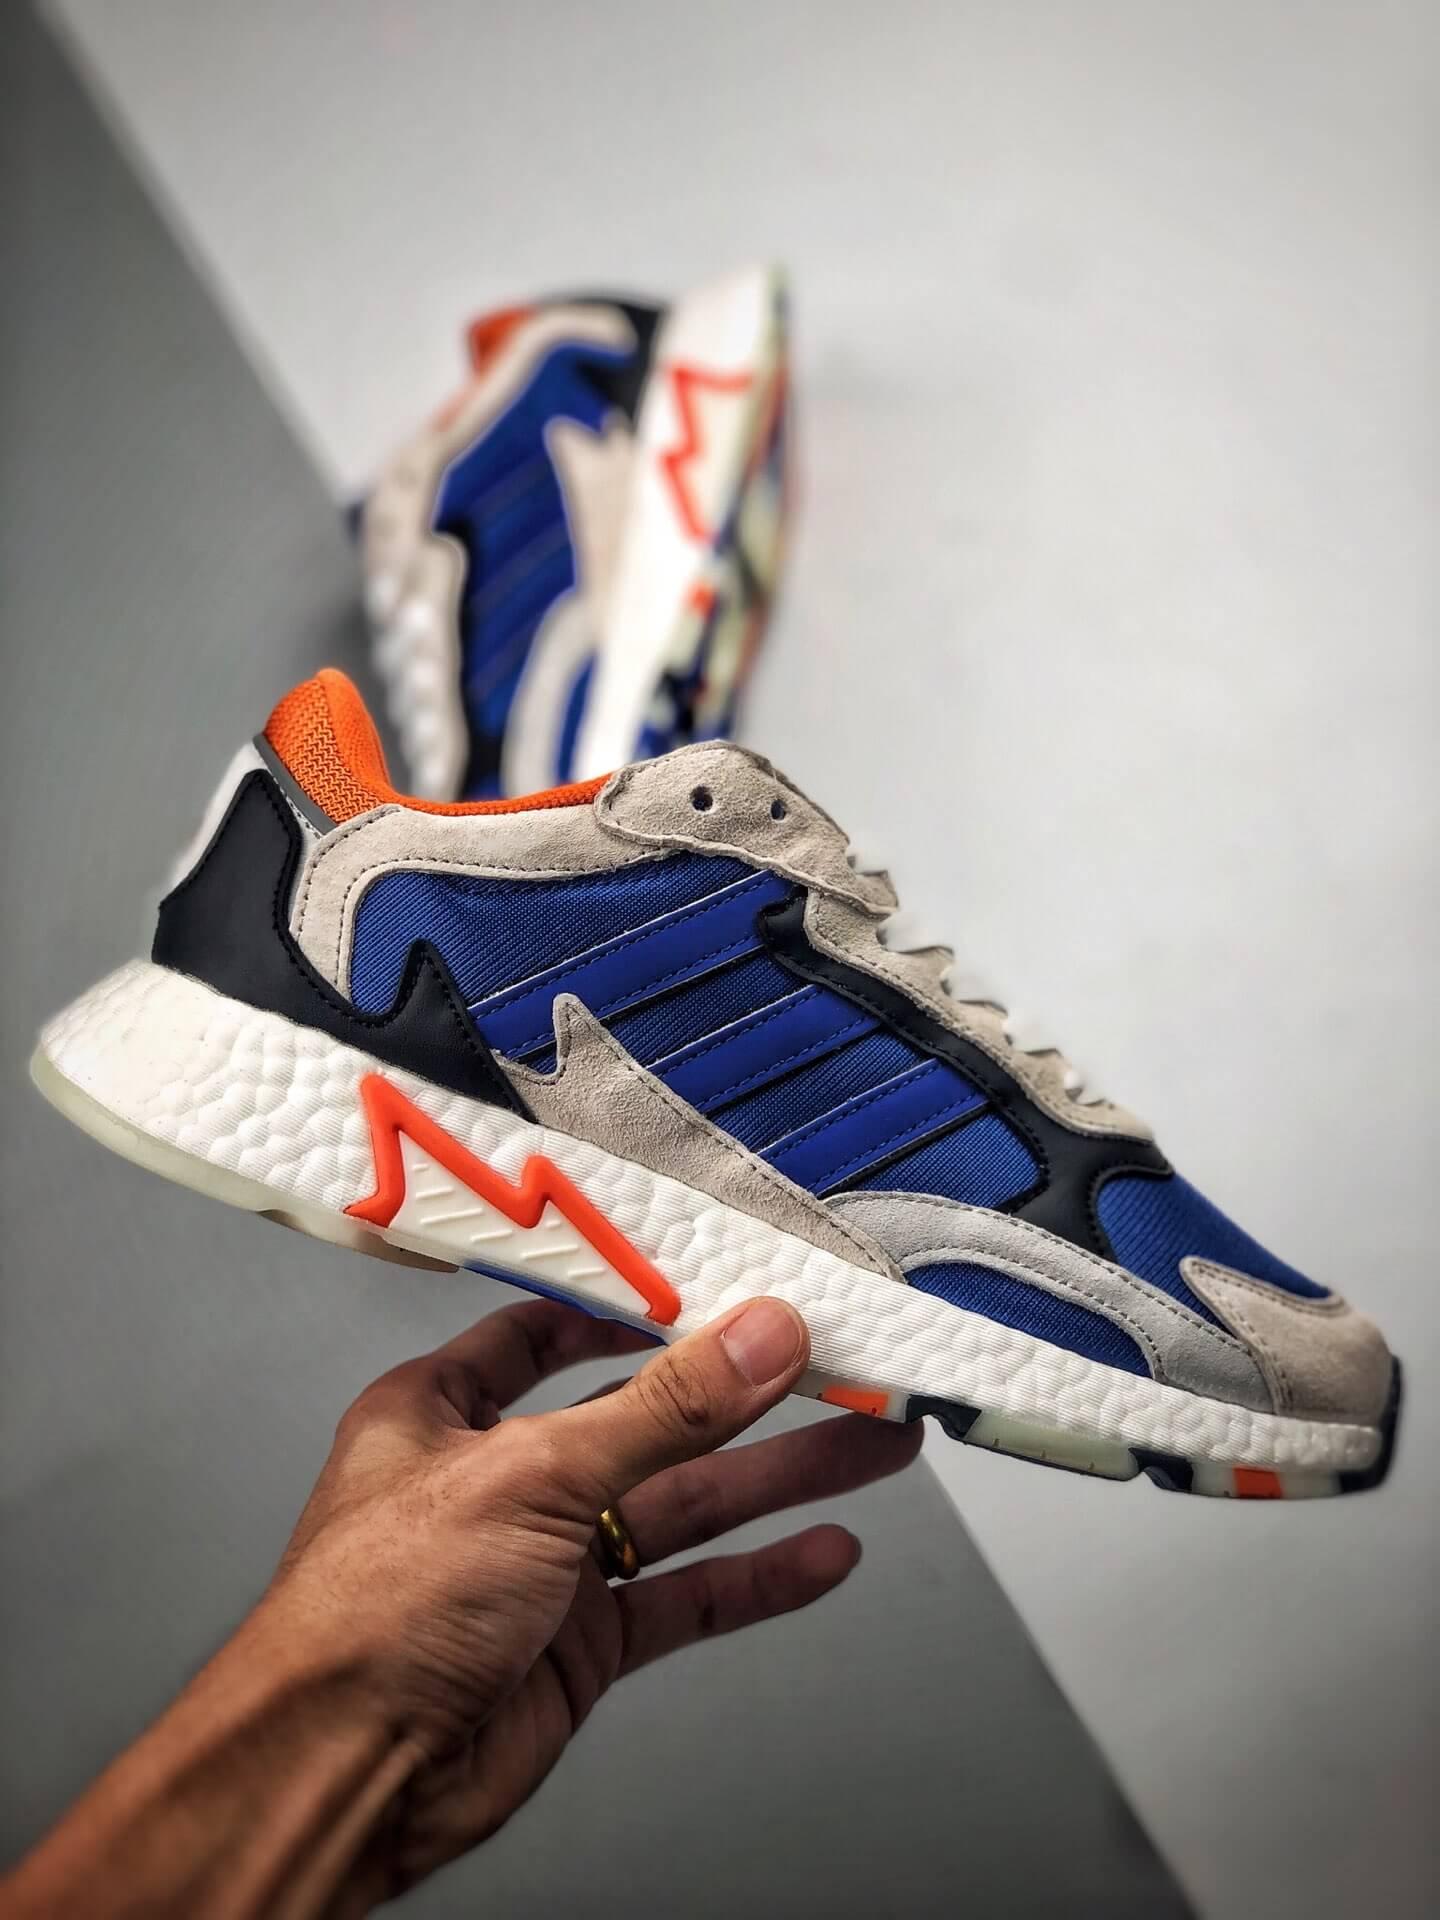 The Adidas Tresc Run Blue Retro BR